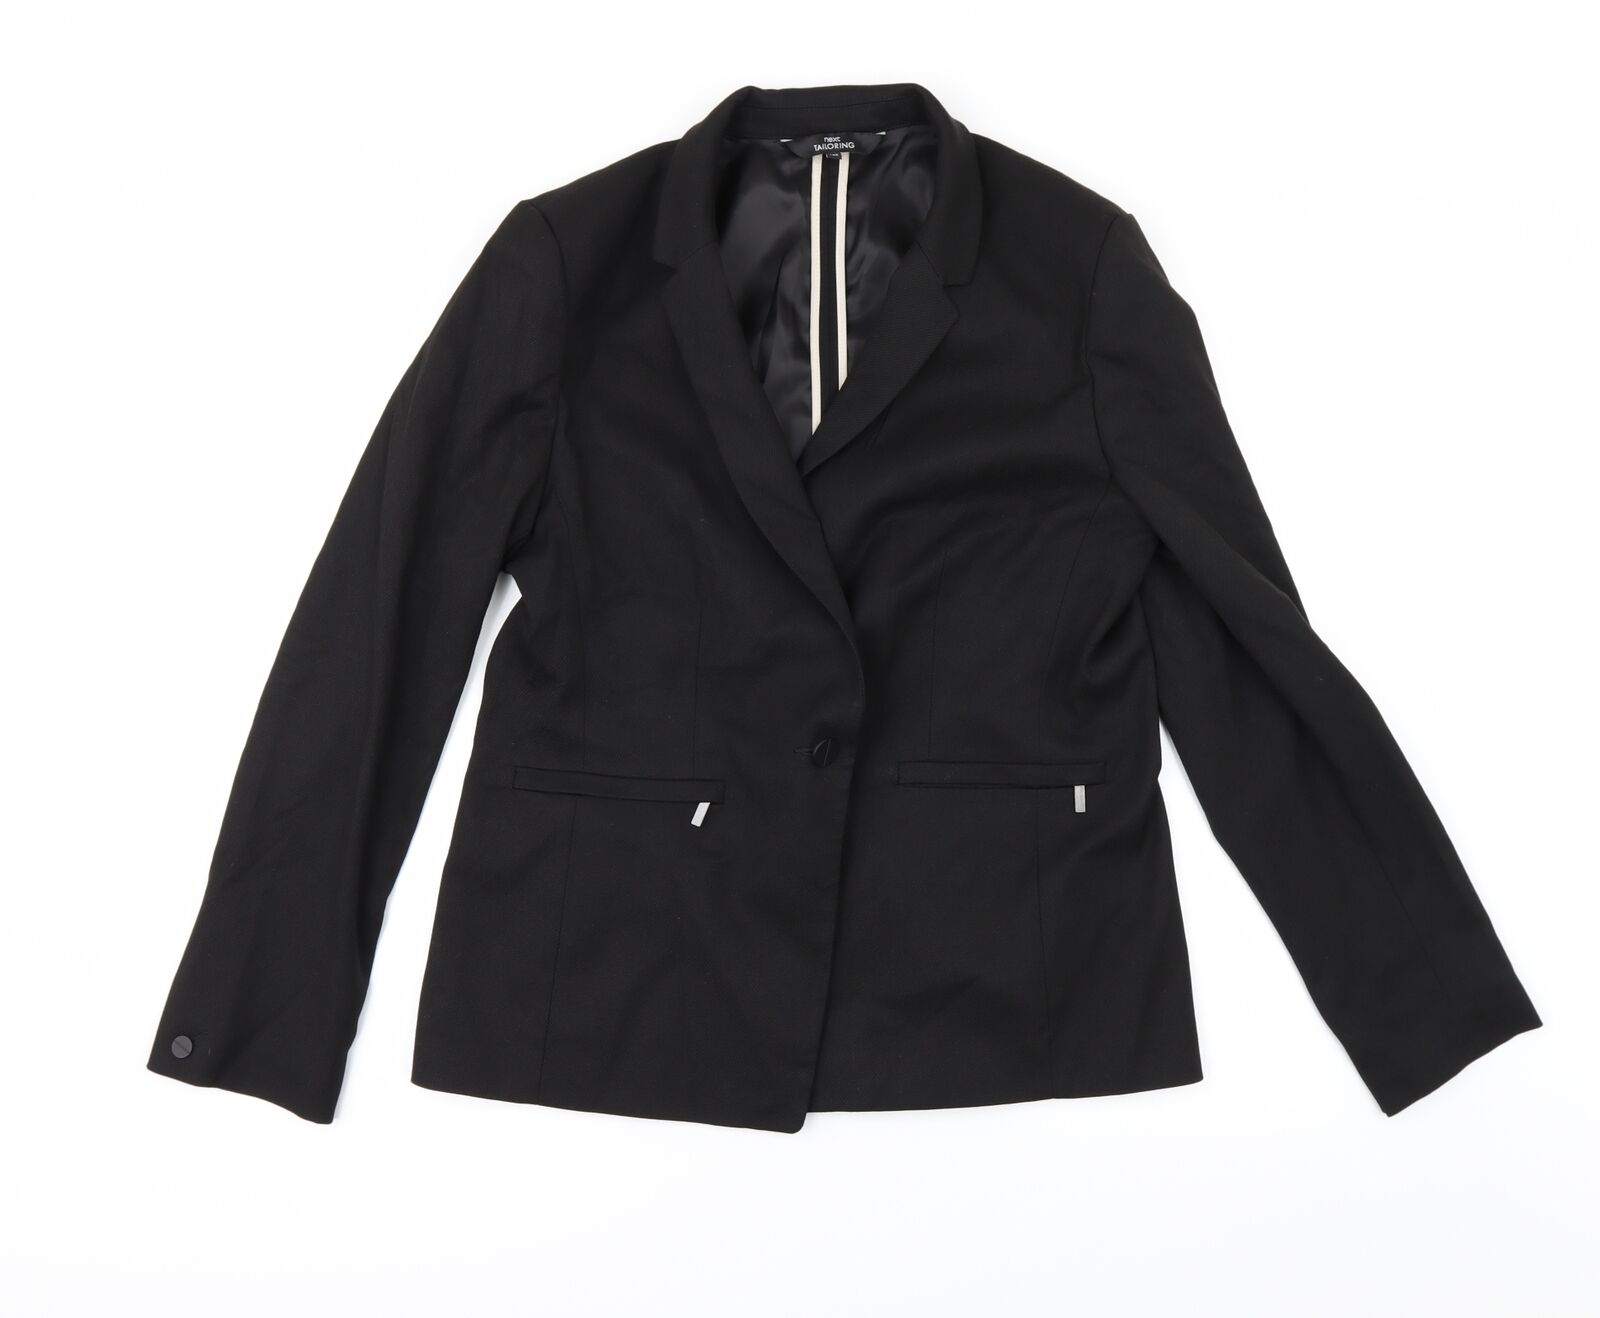 NEXT Womens Black Jacket Suit Jacket Size 16